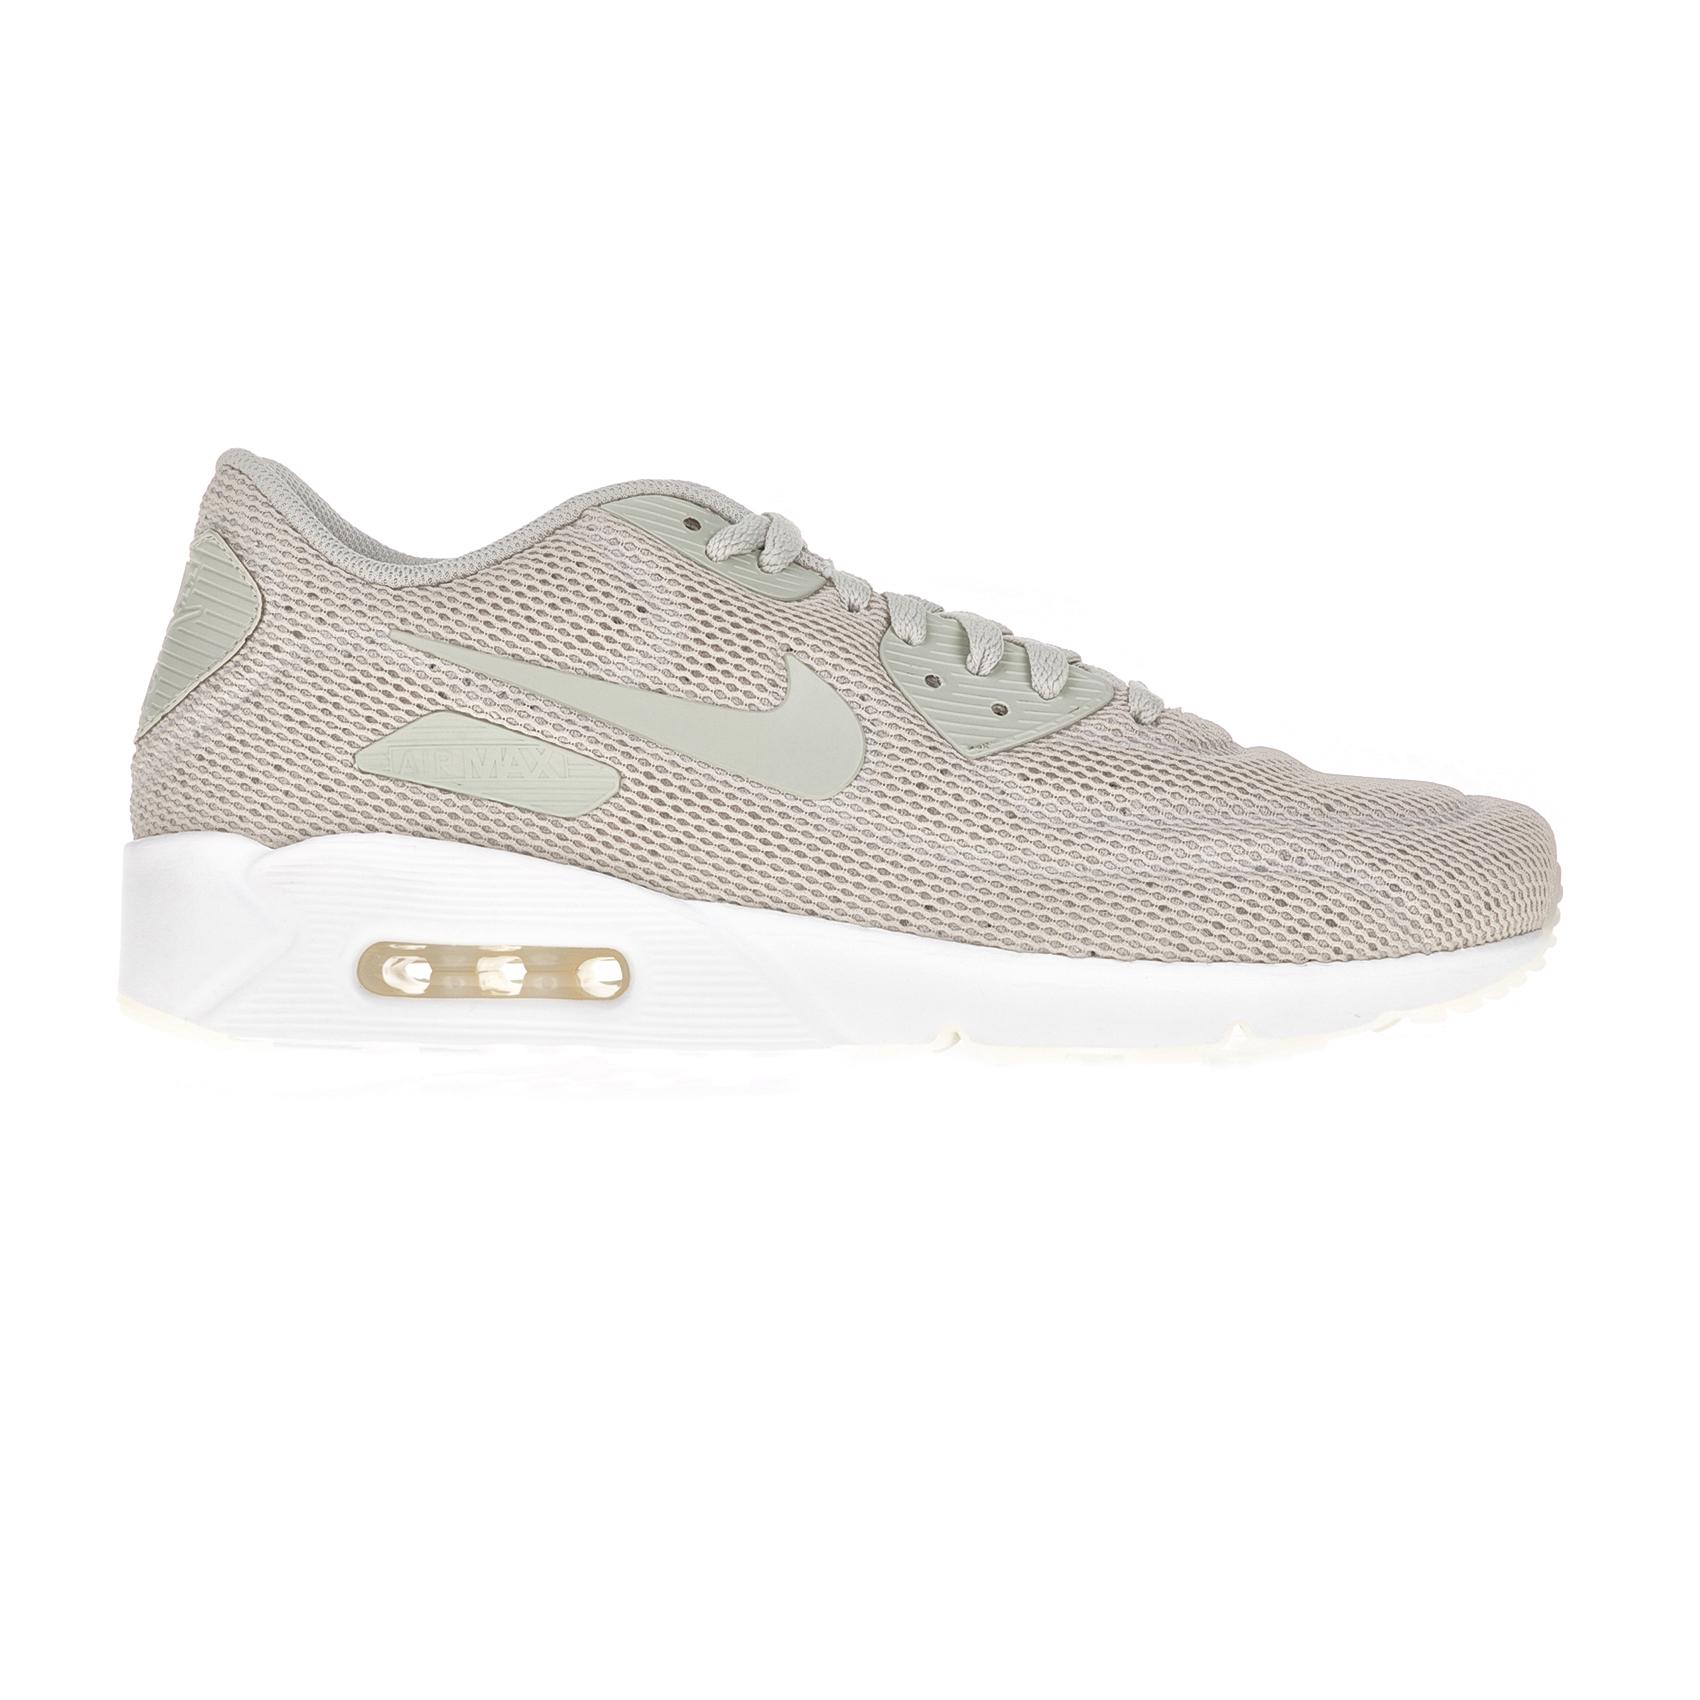 NIKE – Ανδρικά αθλητικά παπούτσια NIKE AIR MAX 90 ULTRA 2.0 BR μπεζ-λευκά